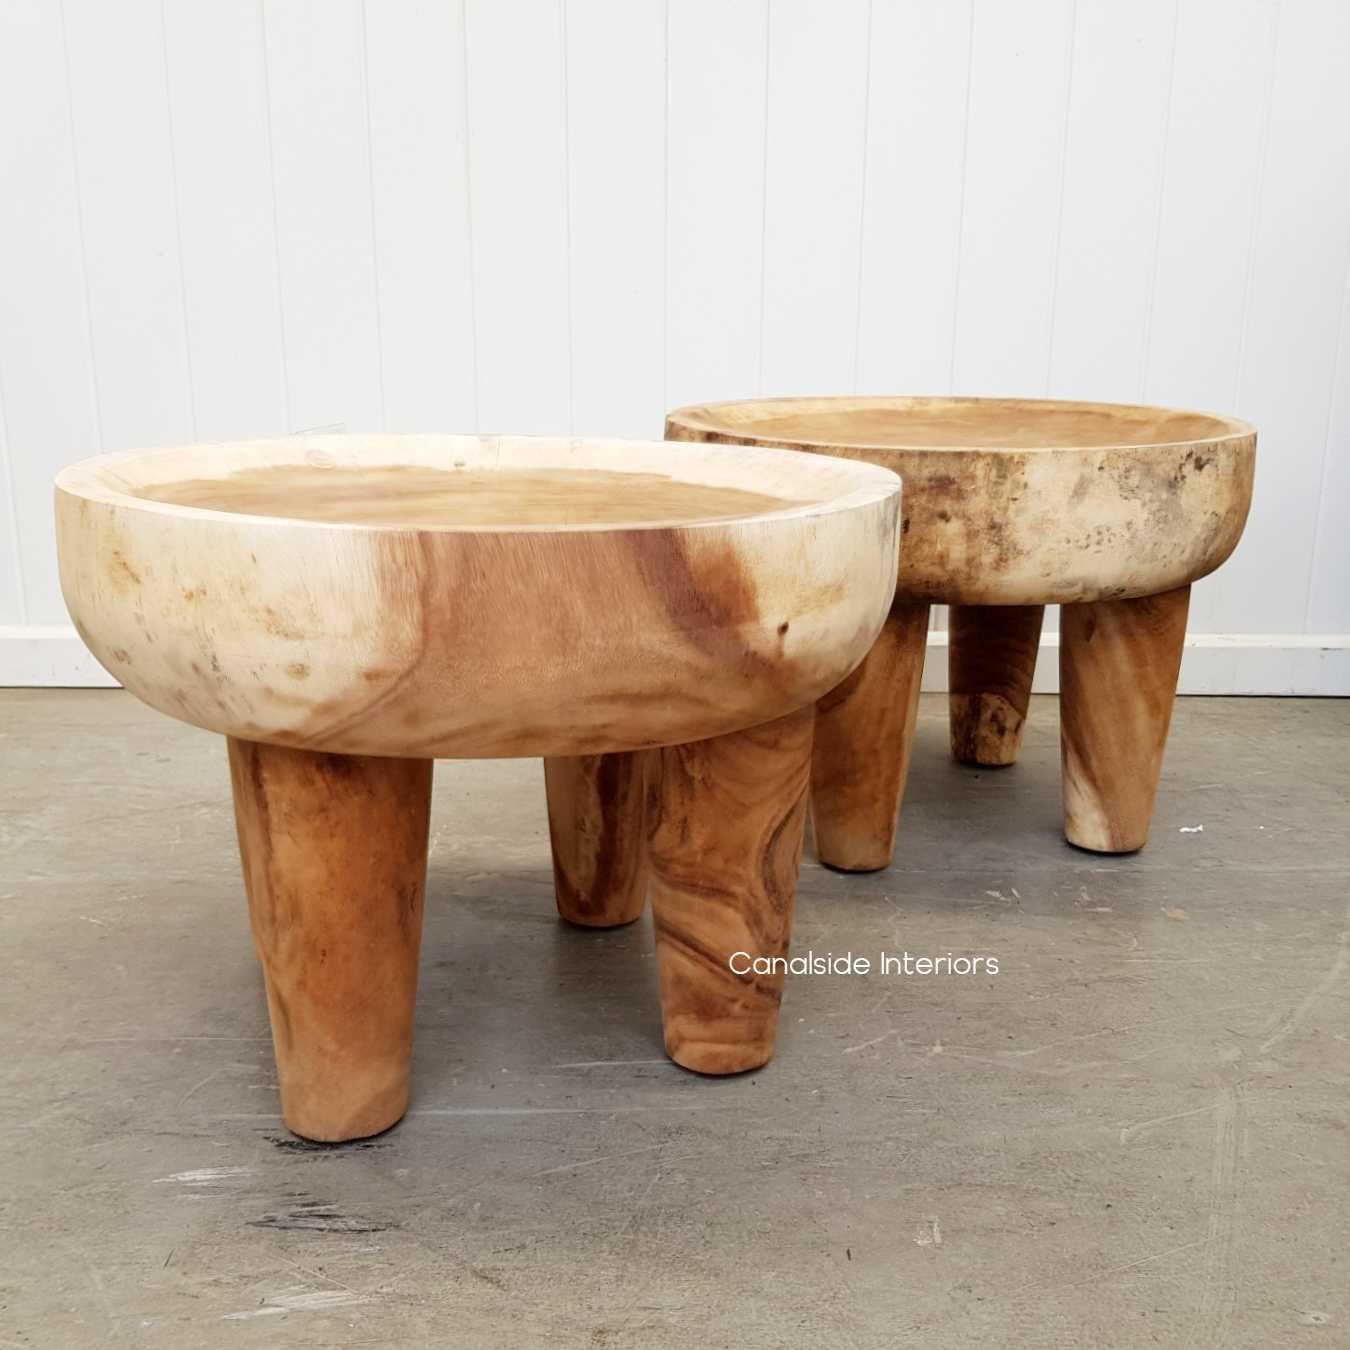 Tamale Natural Side Table  INDUSTRIAL RUSTIC Style, TABLES, TABLES Side Tables, LIVING Room, LIVING Coffee & Side Tables, BEDROOM Bedsides